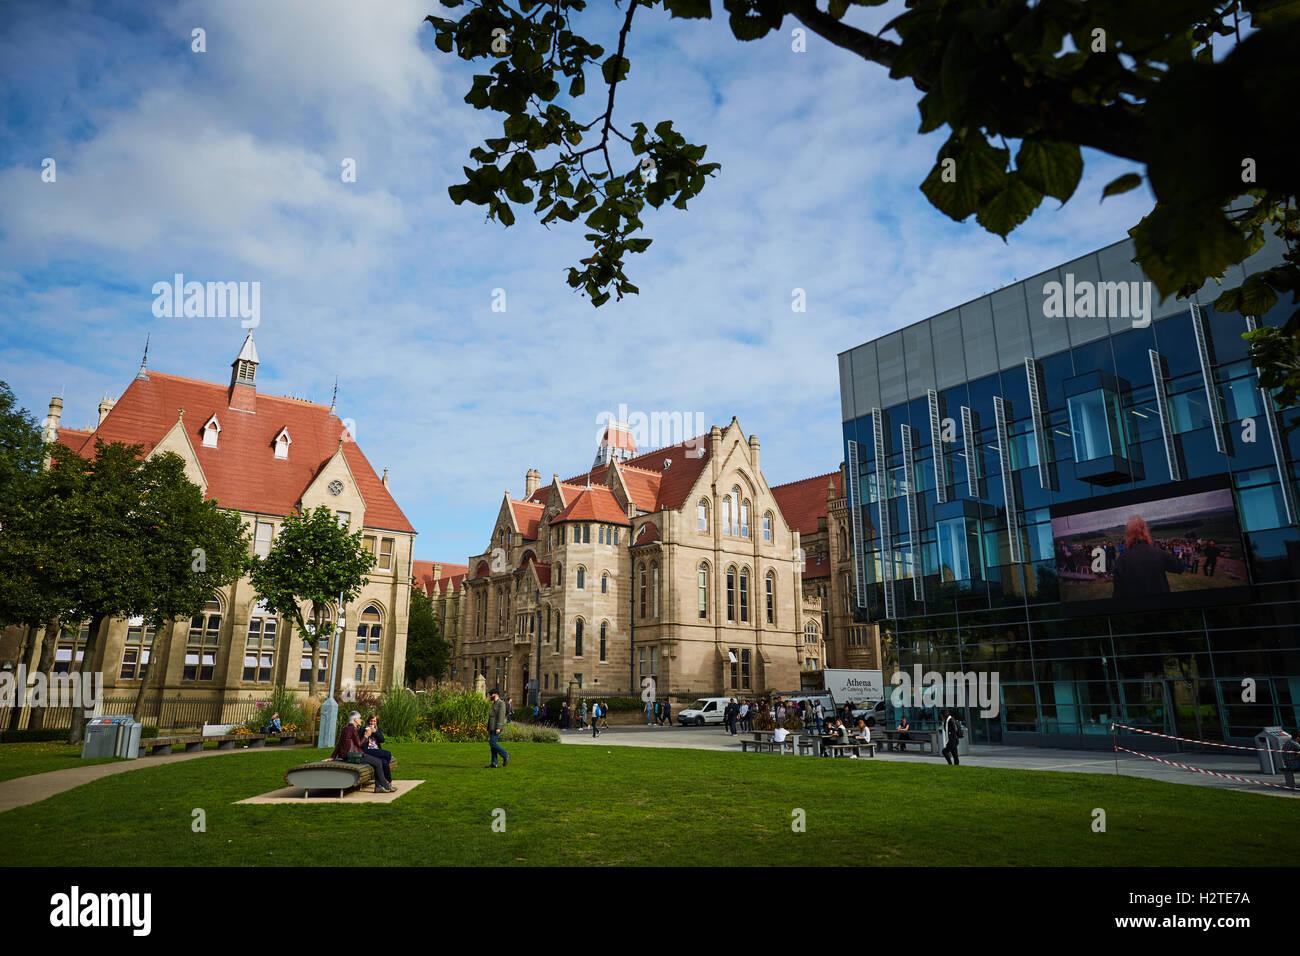 manchester university historic buildings architecture quad stock